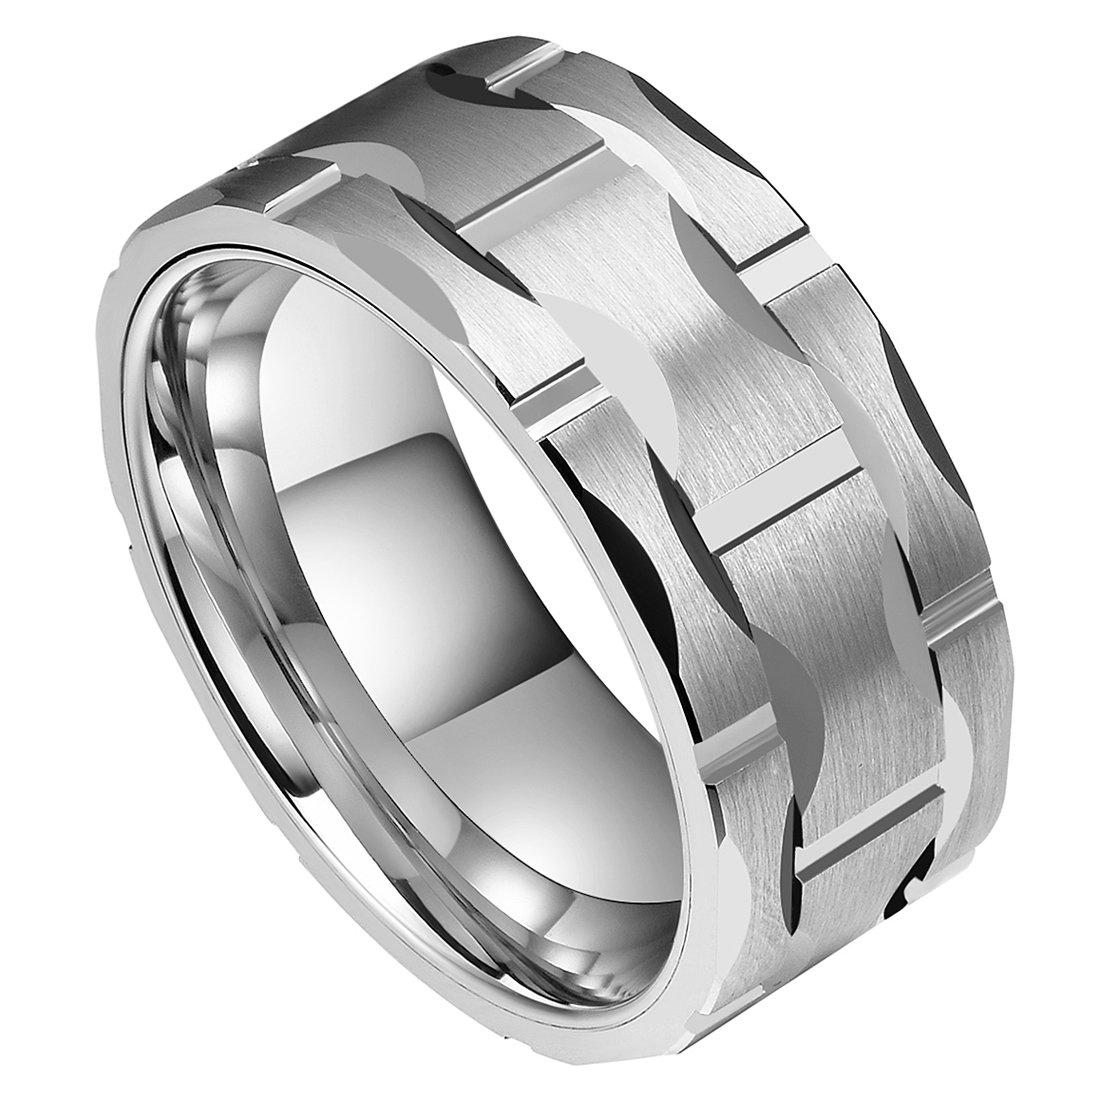 DOUX Men's 10mm Brick Pattern Silver Tungsten Carbide Statement Ring Wedding Ring For Anniversary 11